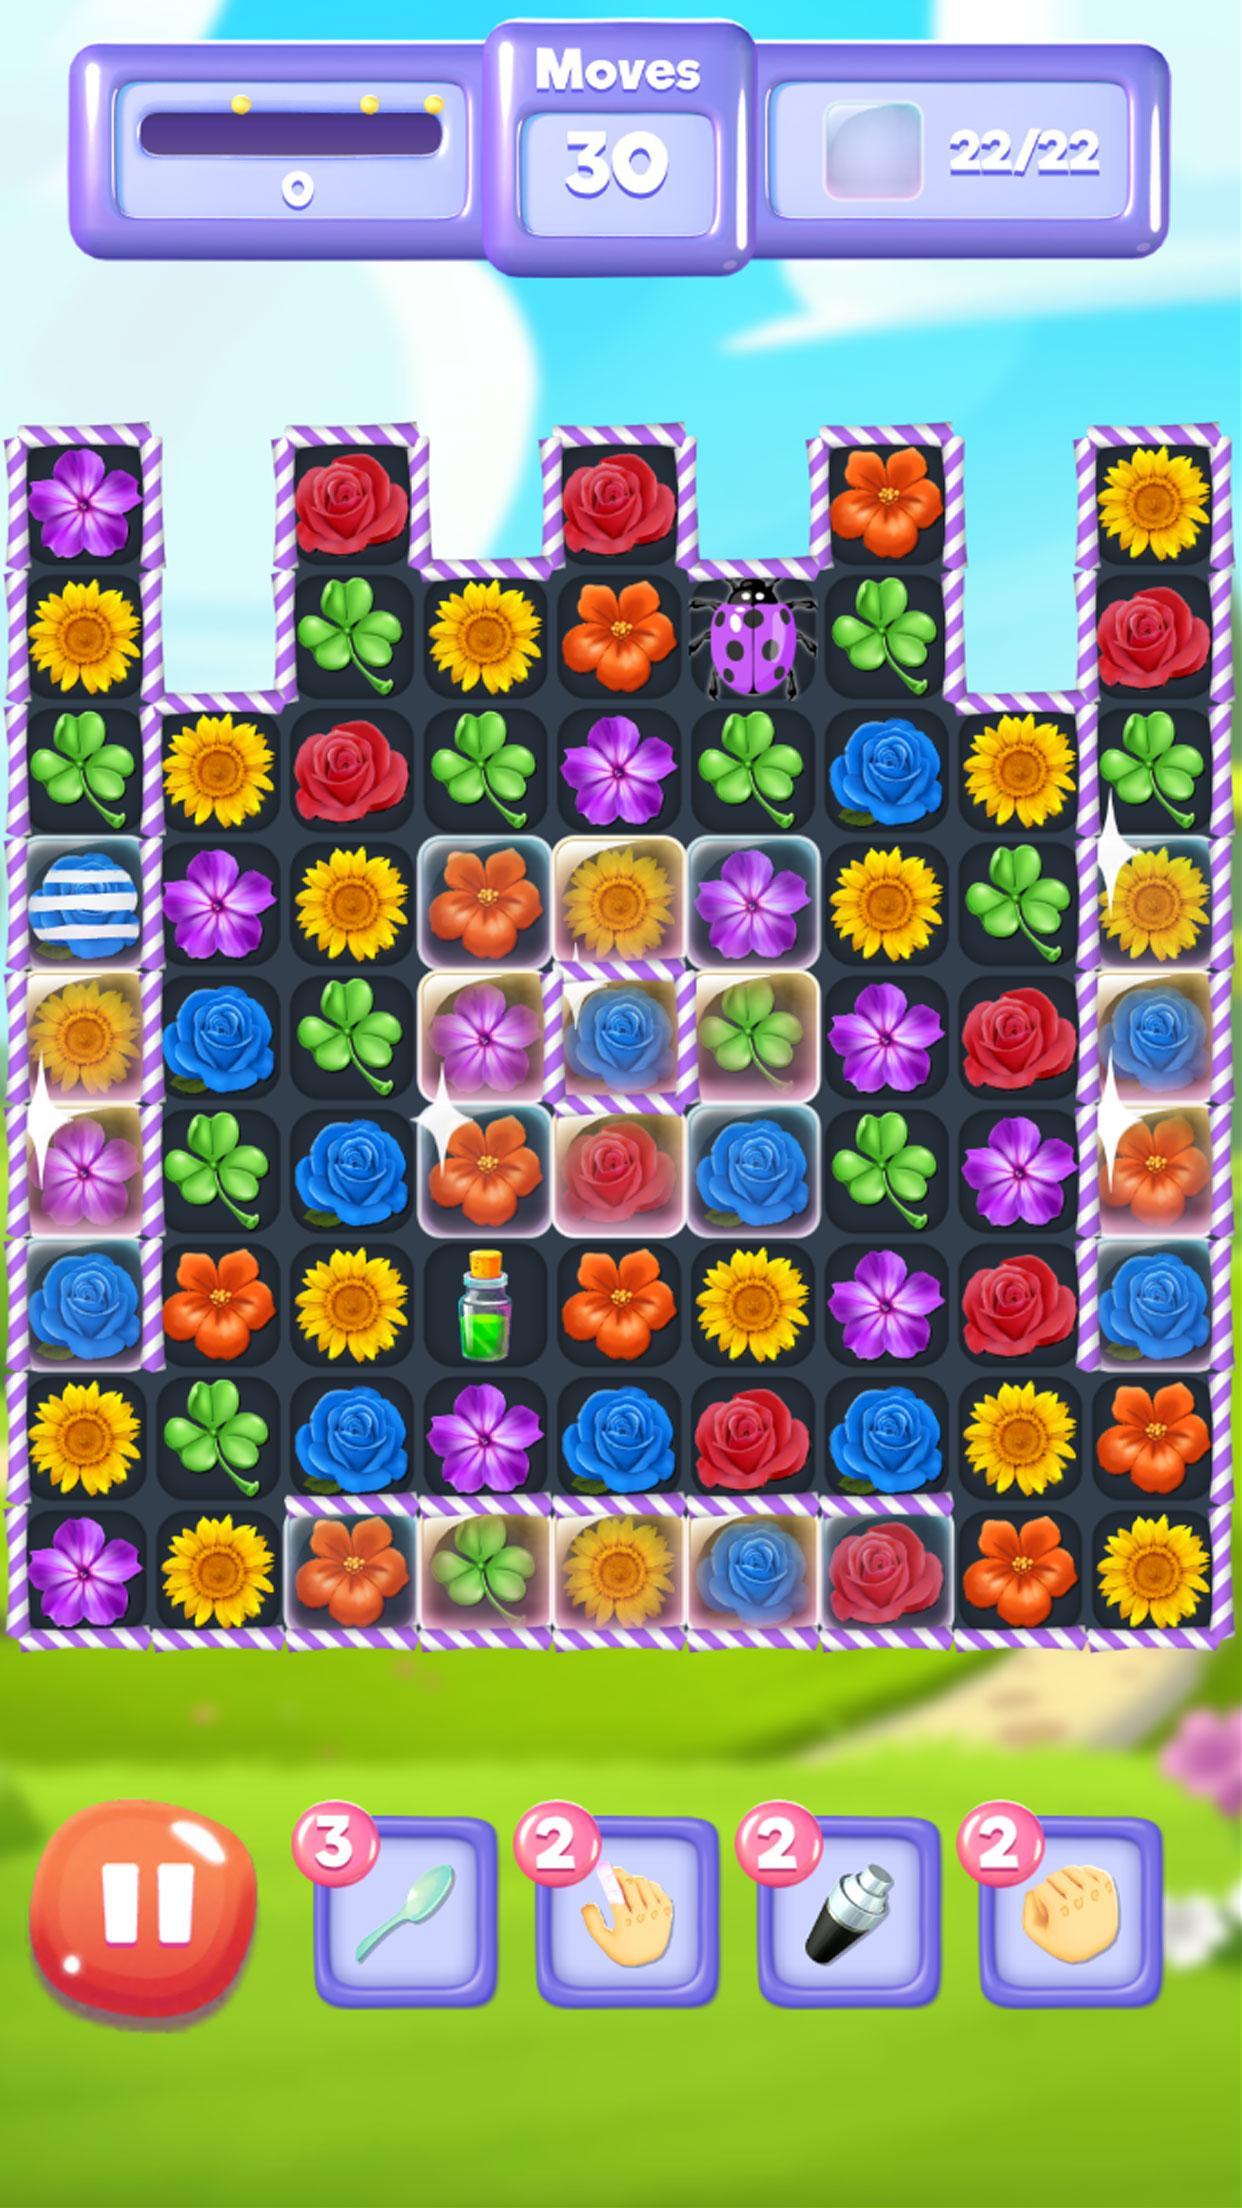 Blossom Bloom Flower Blast Match 3 Games 1.9 Screenshot 5